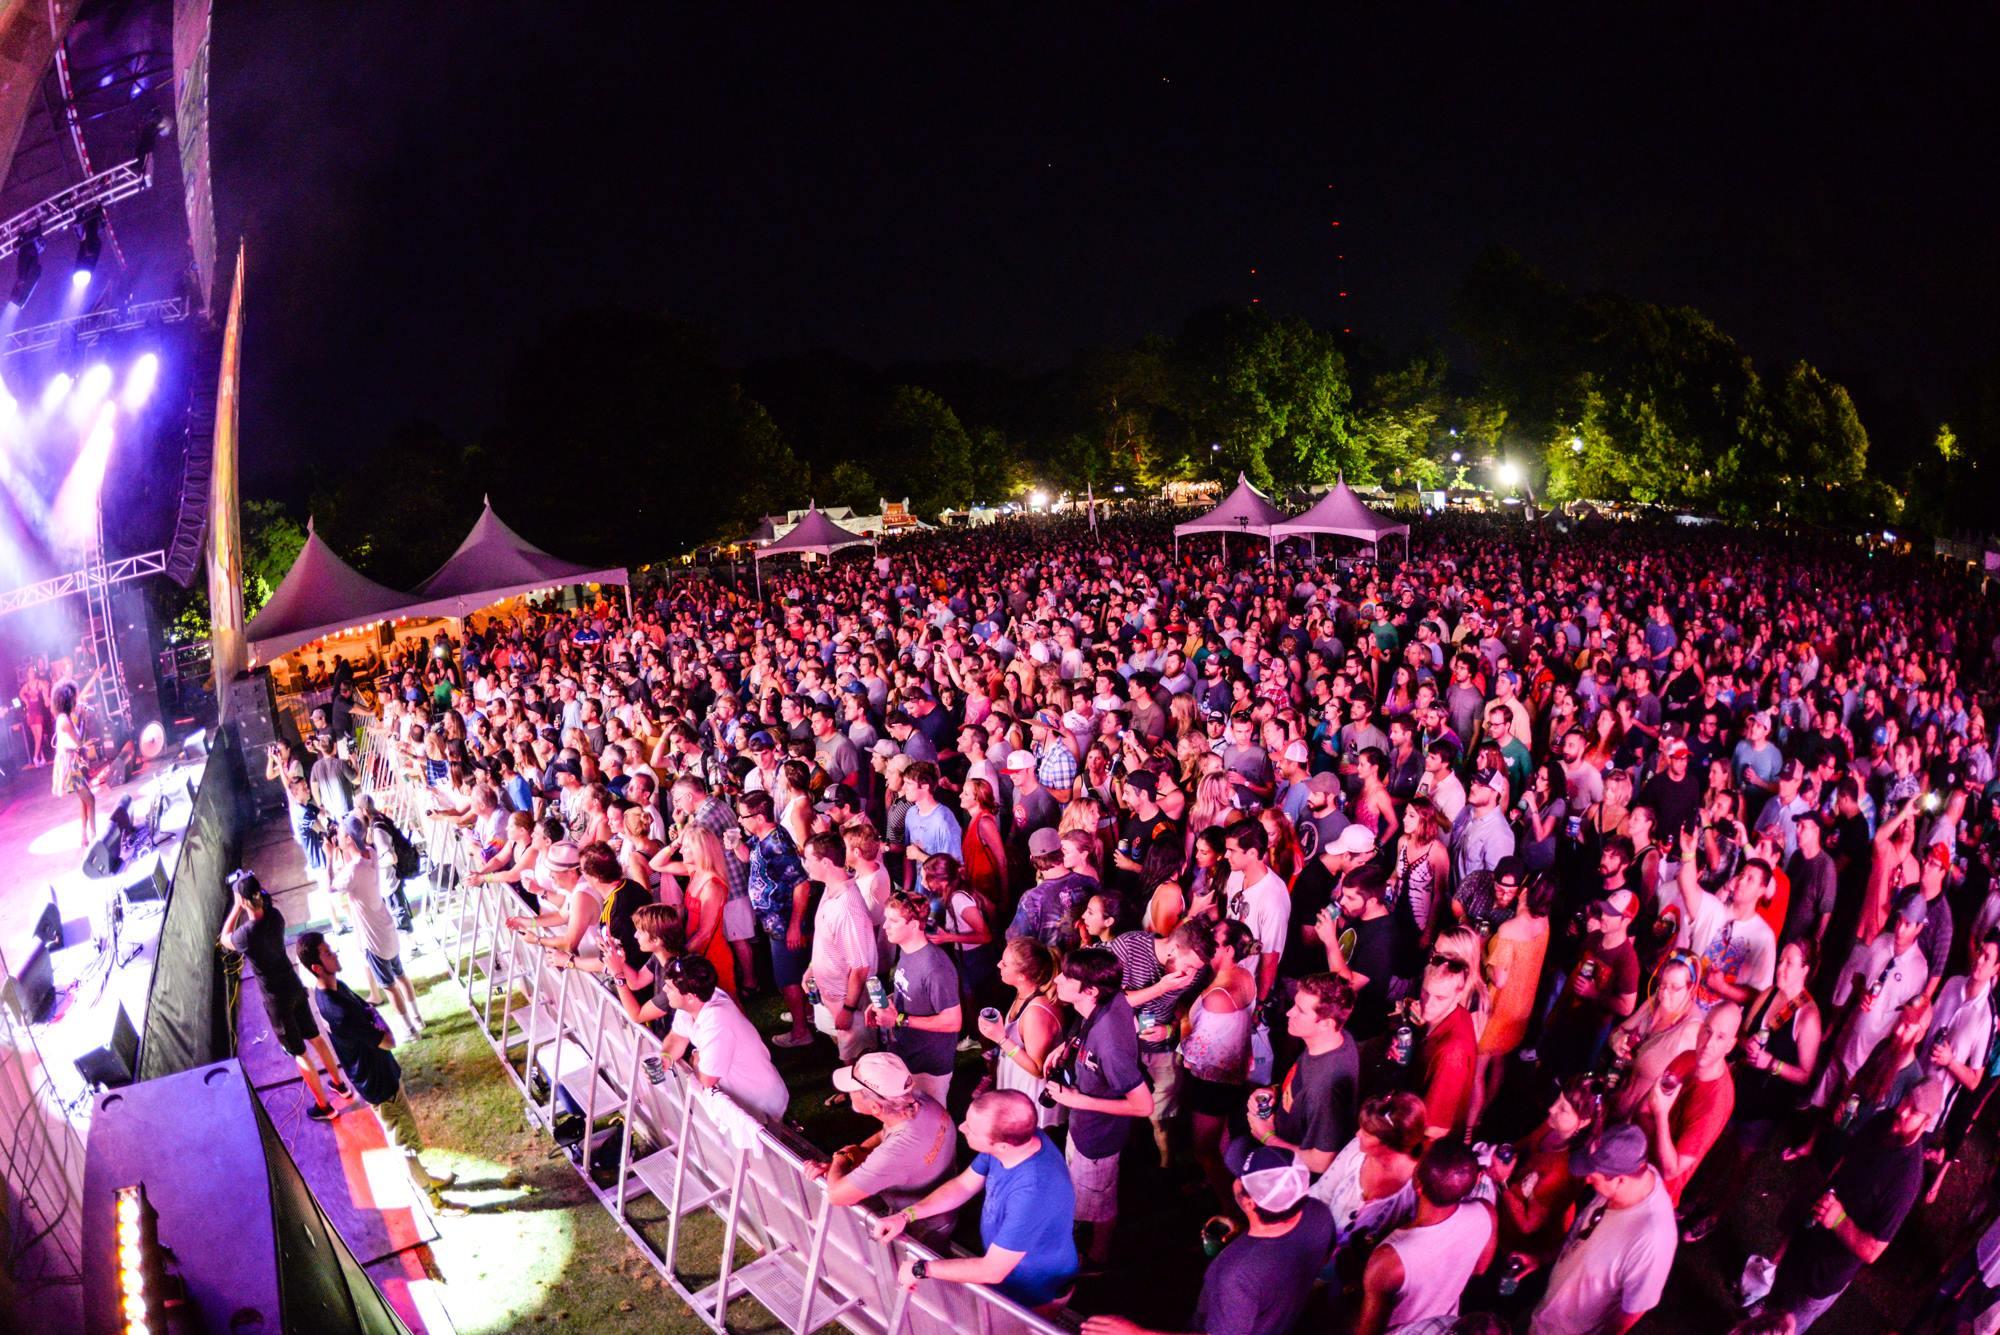 http://candlerparkmusicfestival.com/past-recaps/